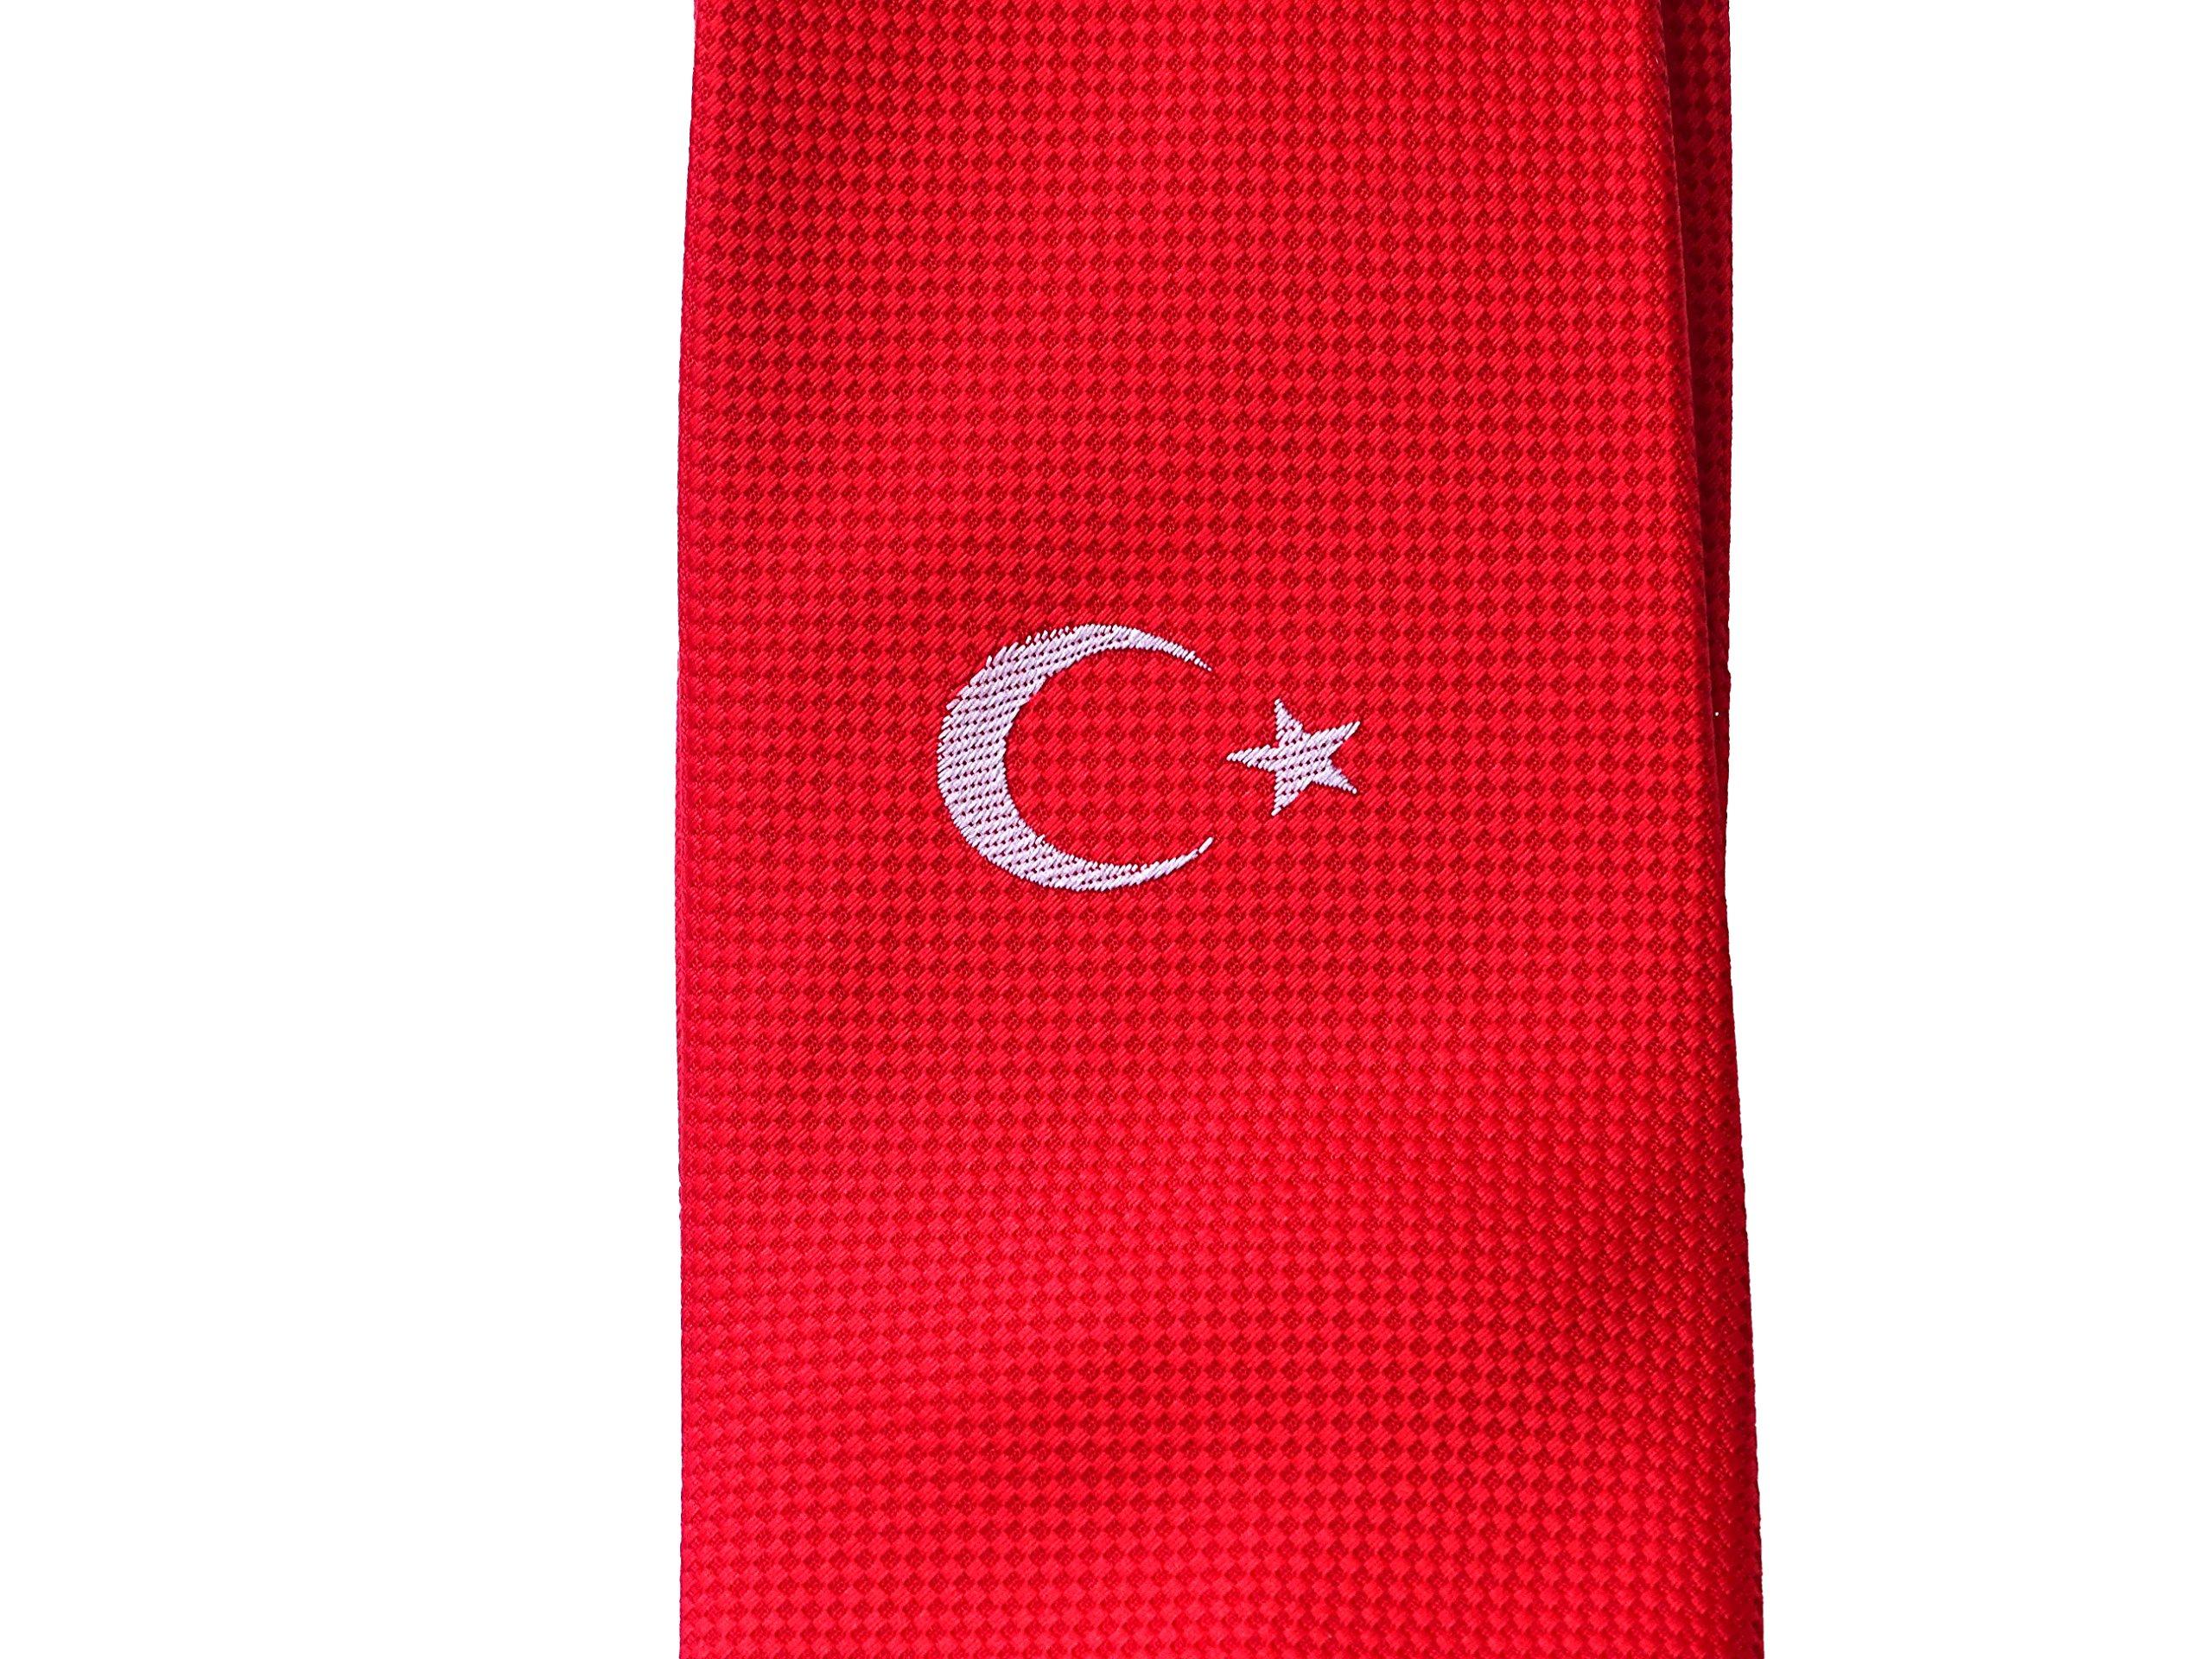 PB Pietro Baldini Türkische National Krawatte - Krawatten türkei flagge - Krawatte attatürk gewebt - Krawatte rot…